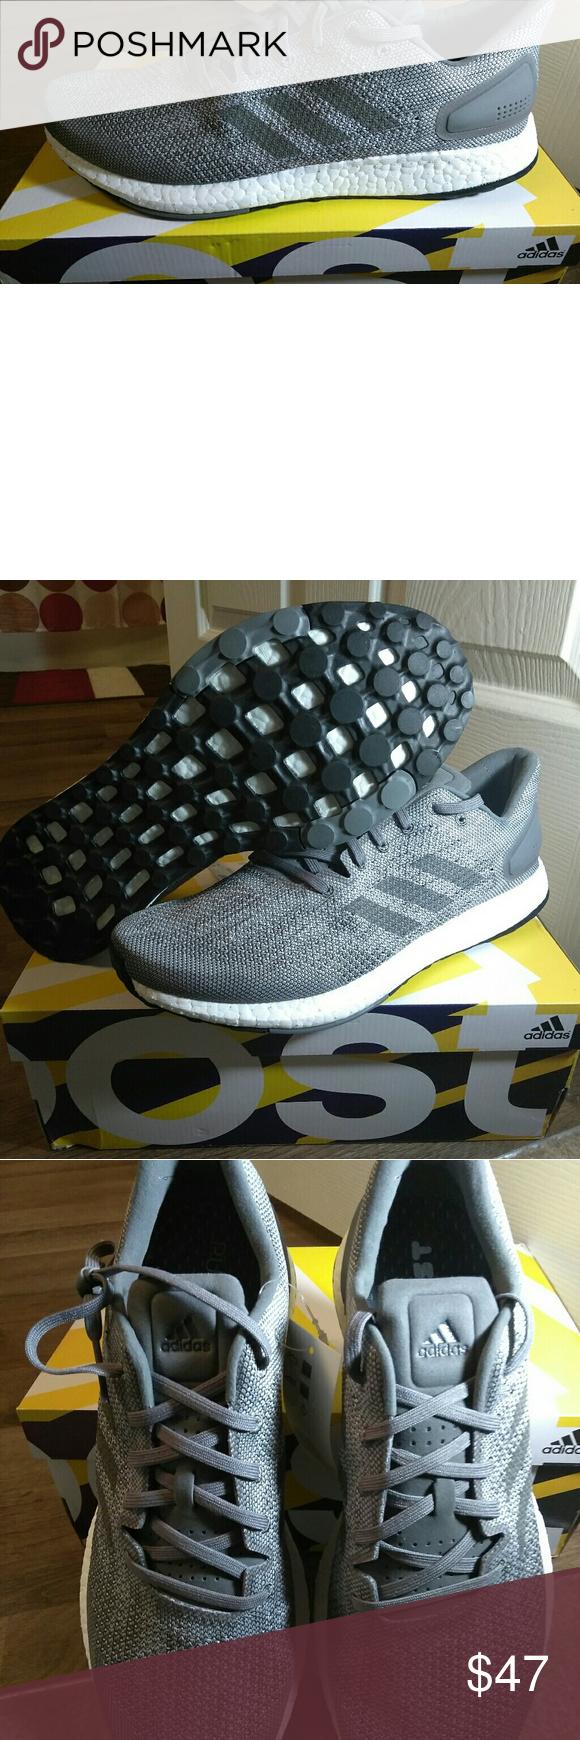 32a6b97369dcd Adidas PureBOOST DPR PC BB6290 Adidas PureBOOST DPR men s size 10 new in  box adidas Shoes Sneakers